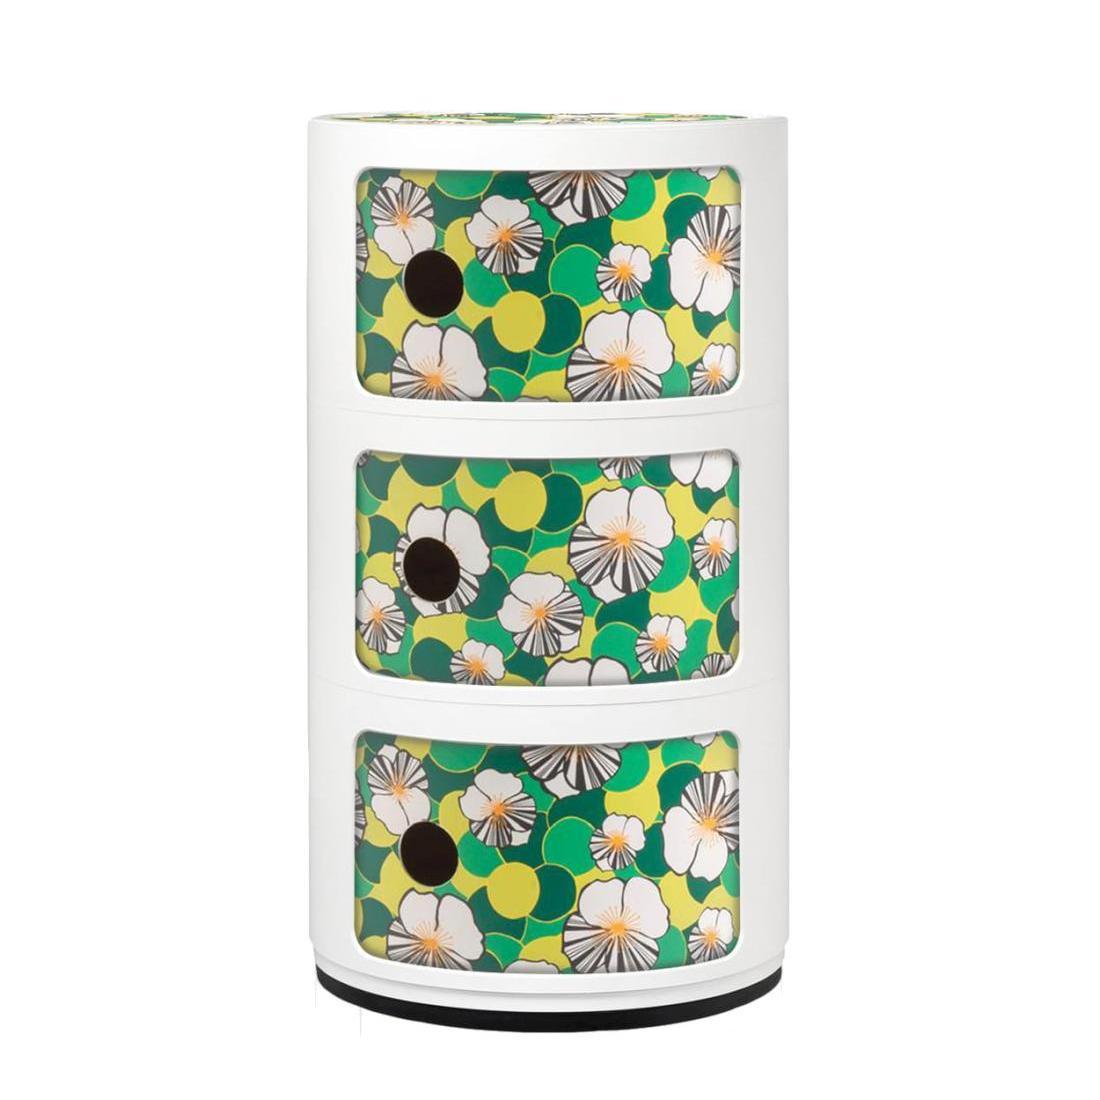 Componibili Container La Double, weiß-grün